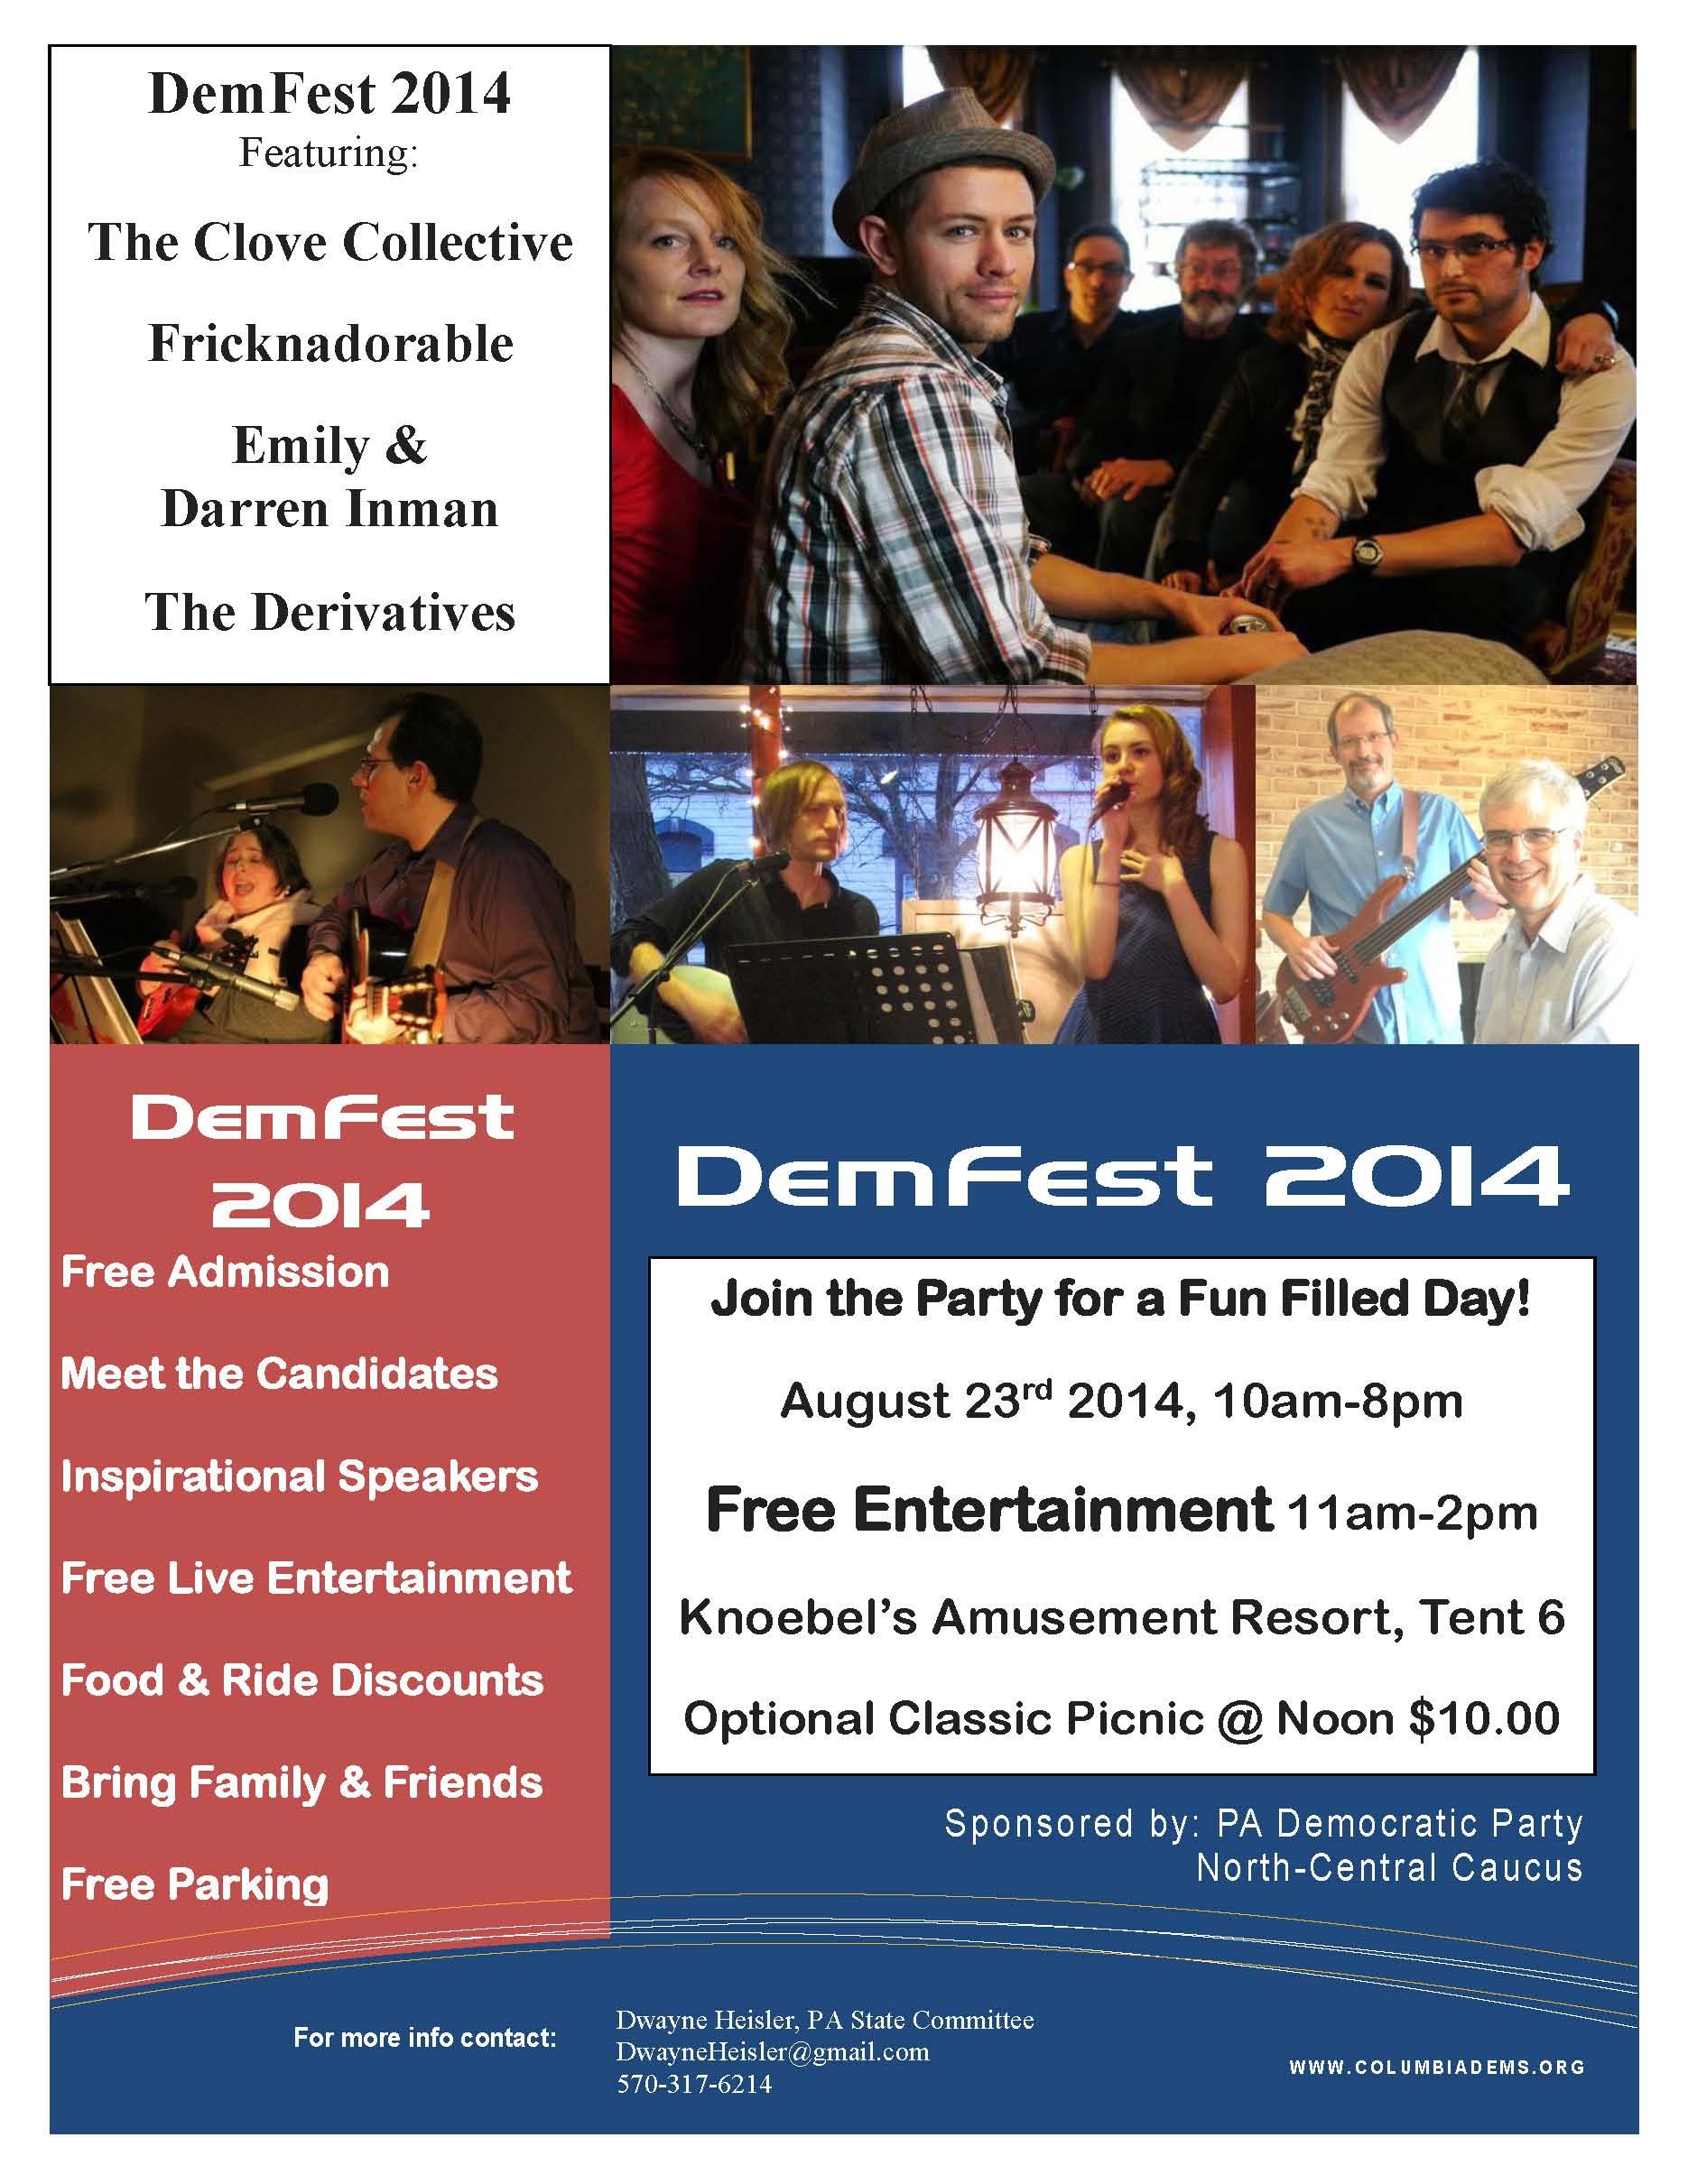 DemFest 2014 Flyer